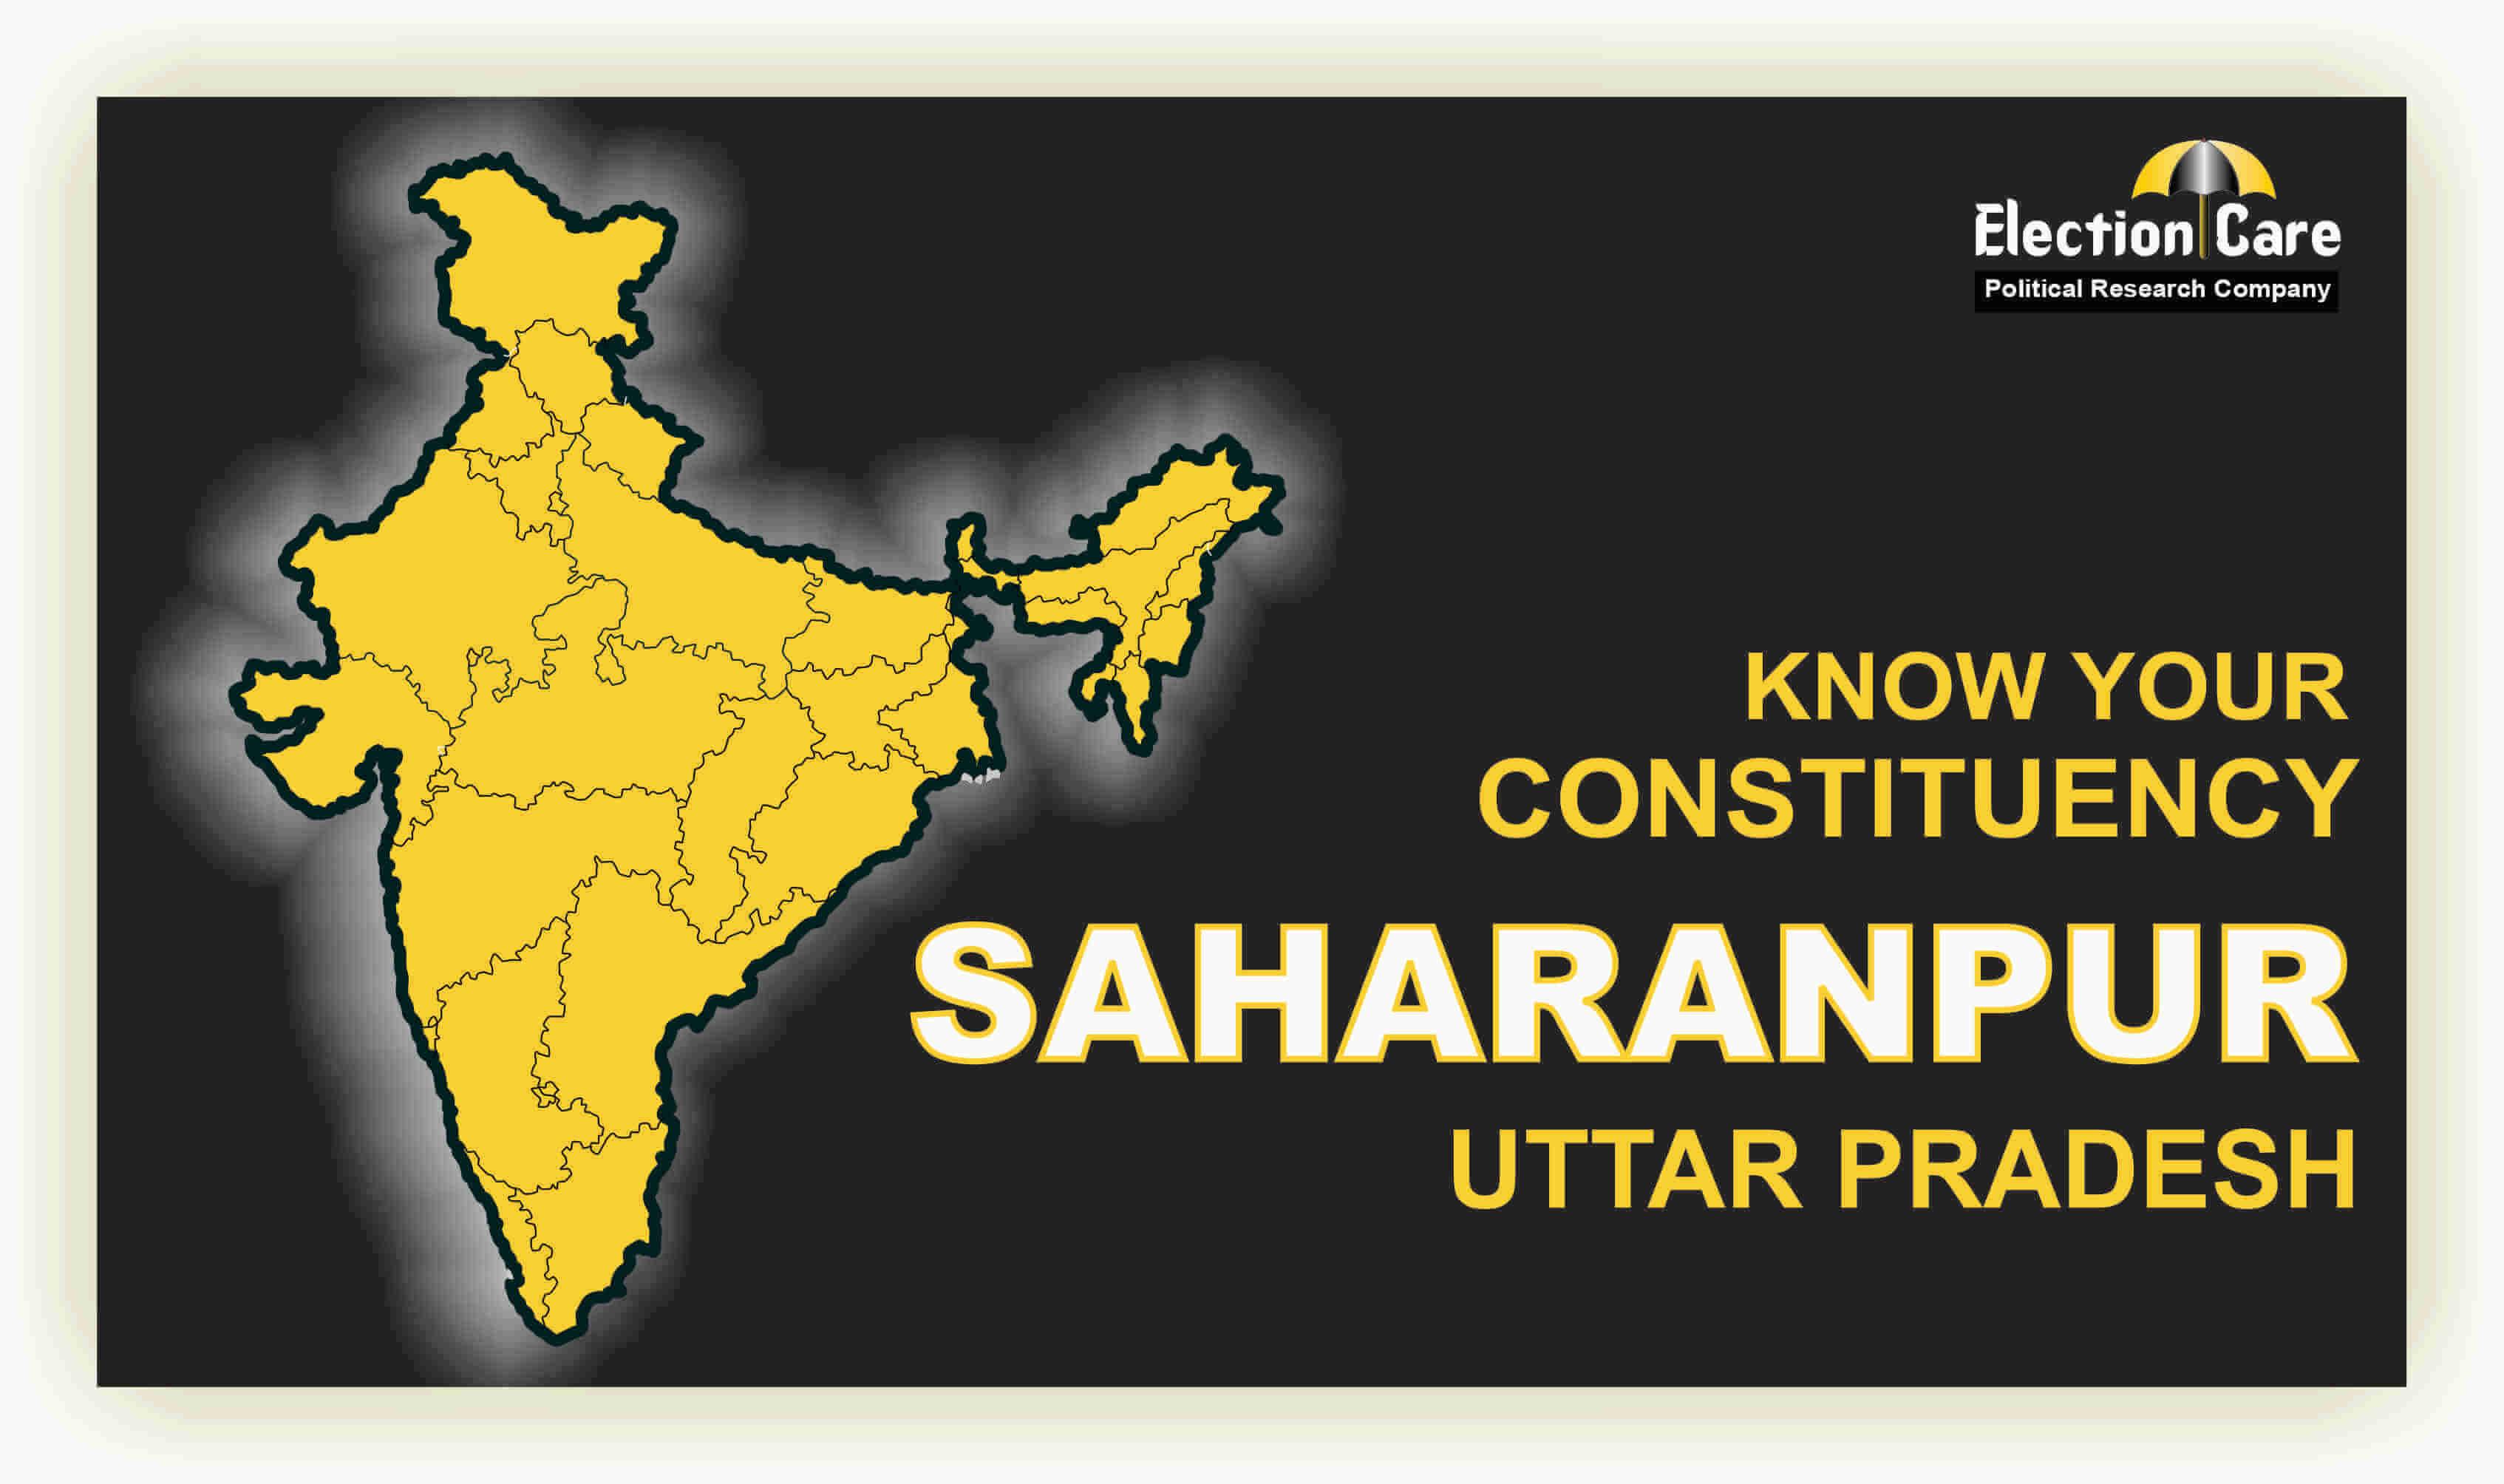 Saharanpur Parliament Election Result